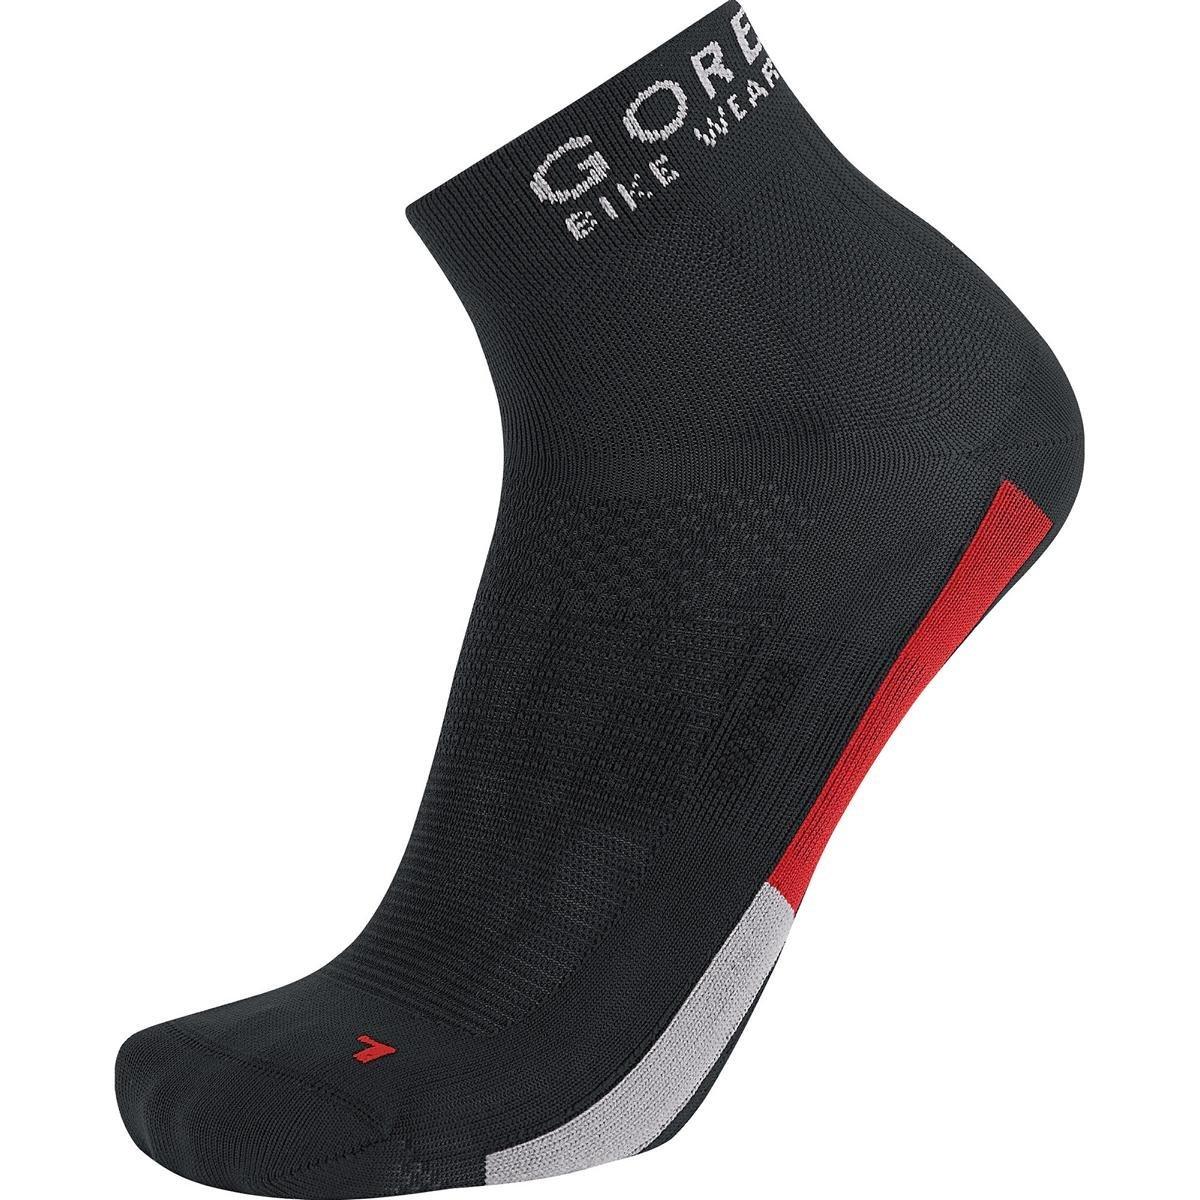 TALLA 38-40. Gore Bike Wear Calcetines Ciclismo Carrera, Súper Ligeros, Gore Selected Fabrics, Oxygen Socks